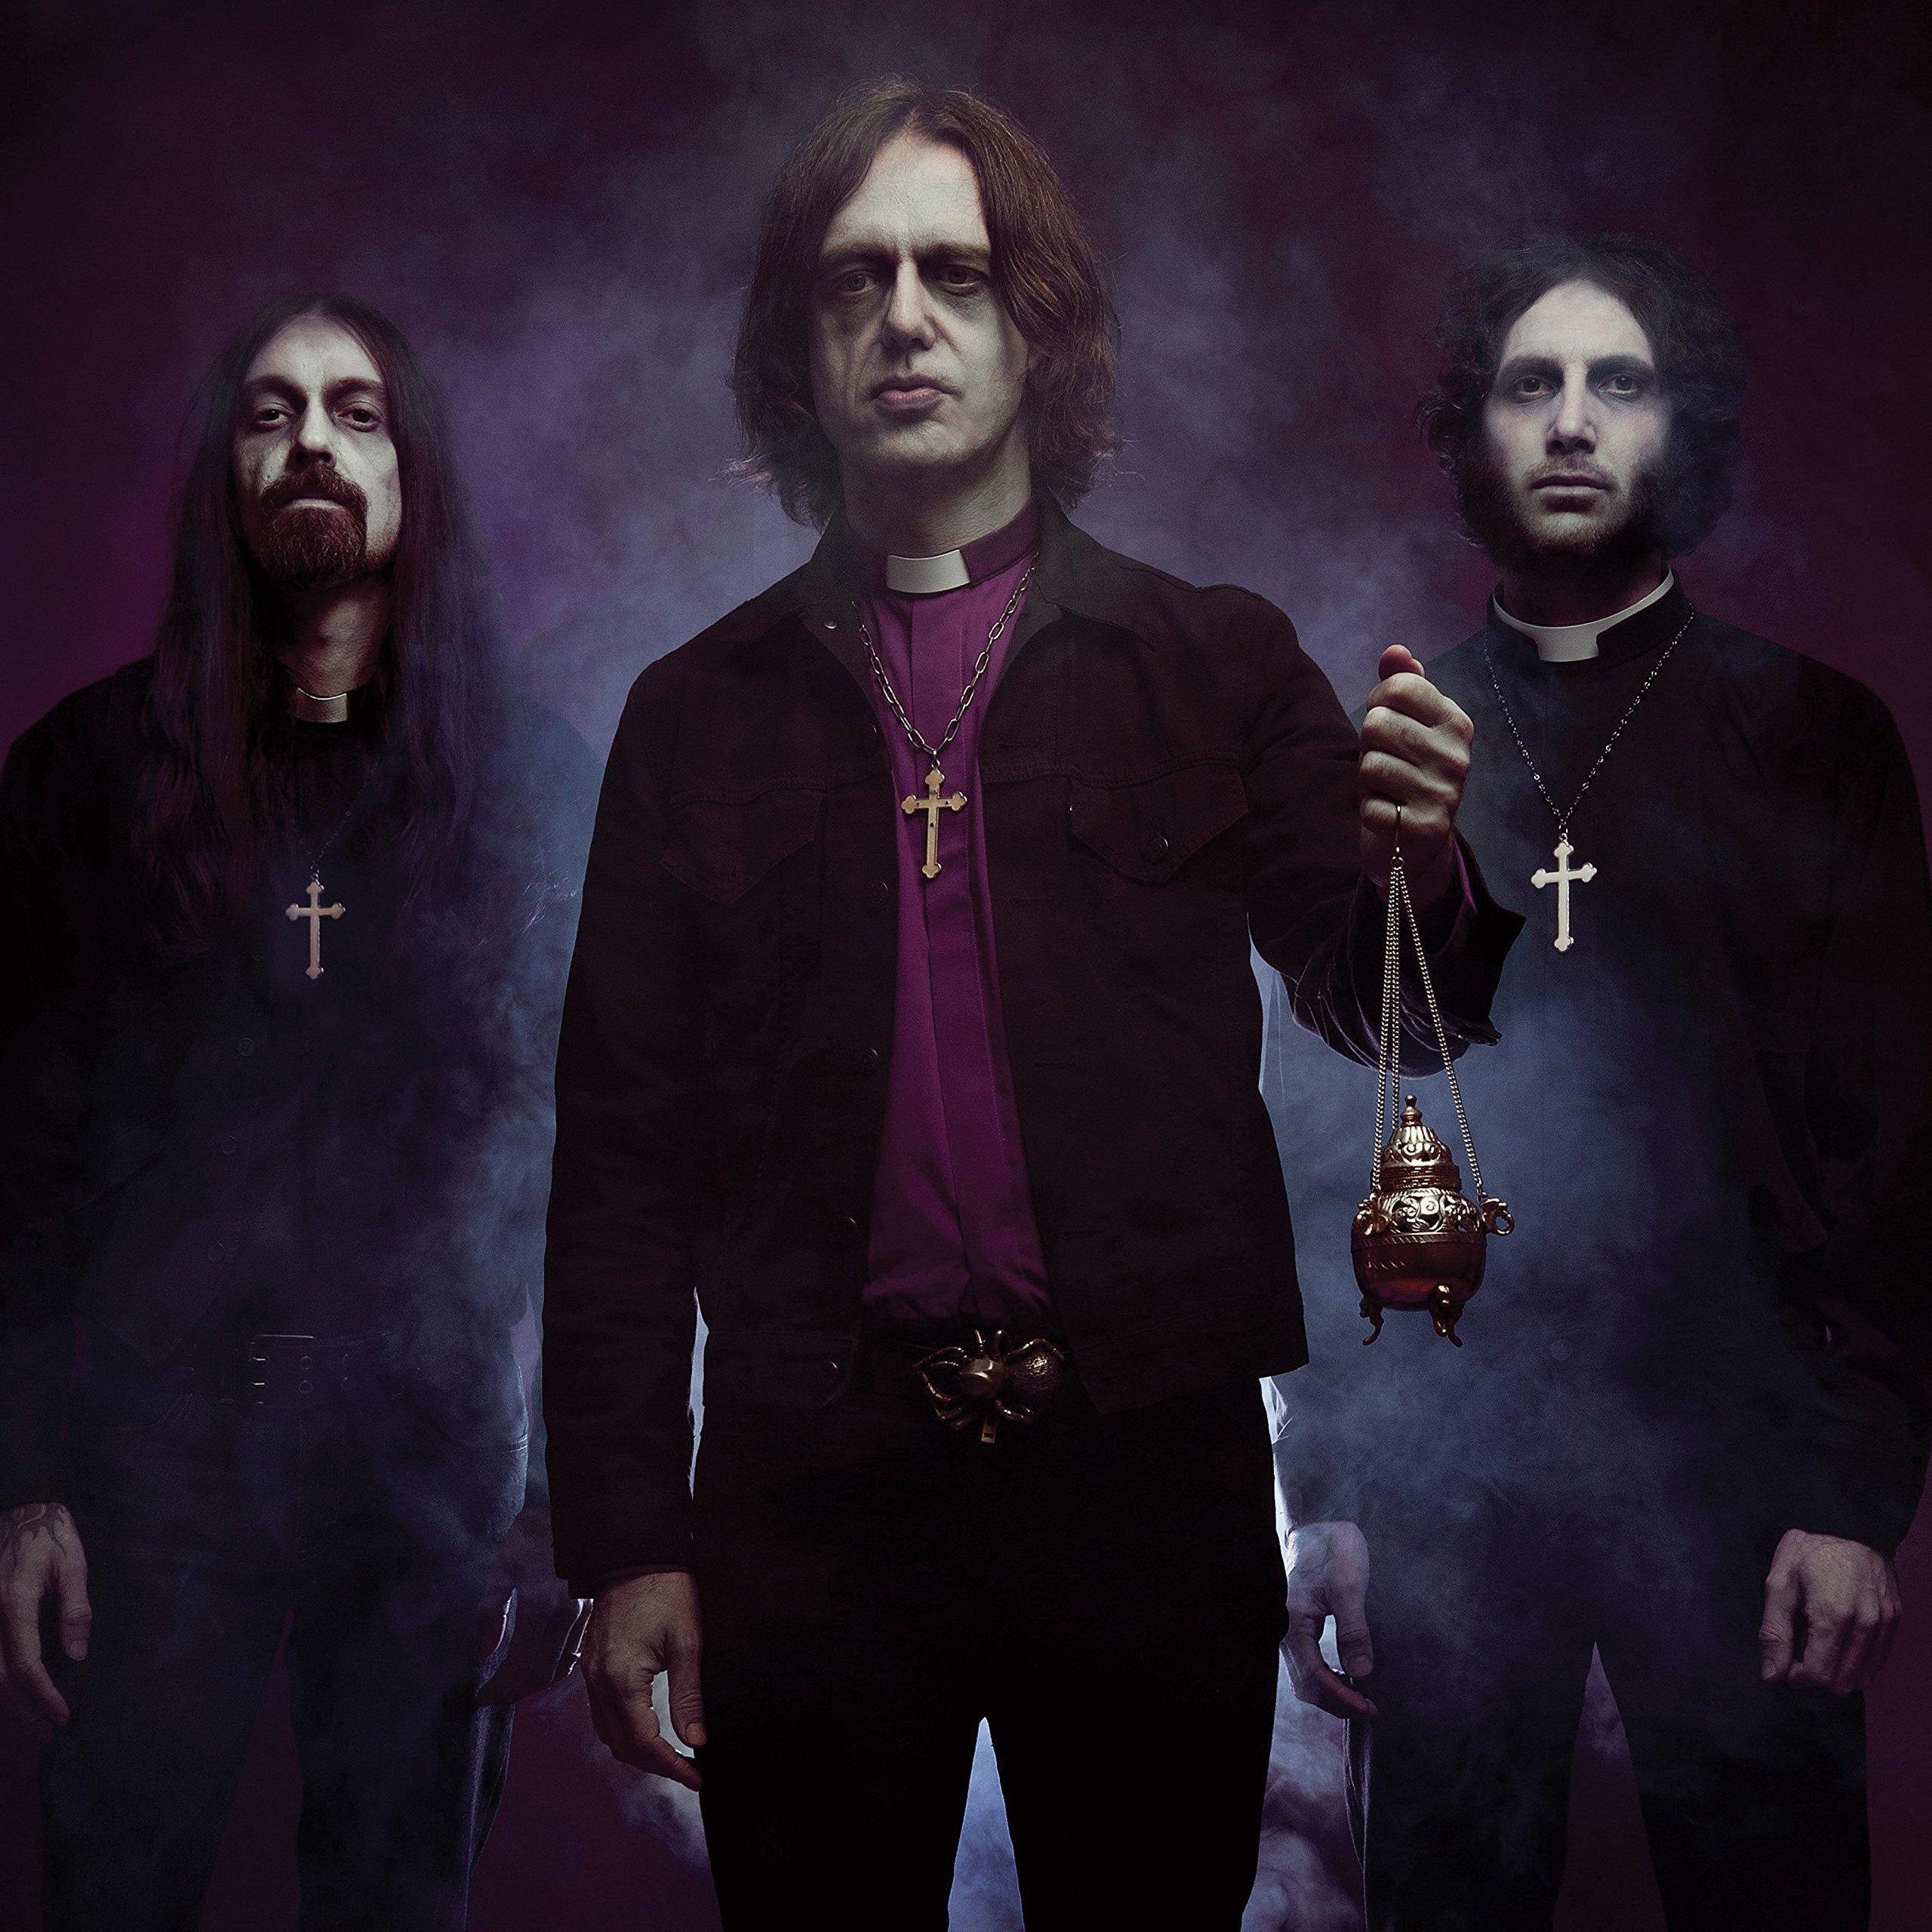 Vinilo : With The Dead - With the Dead (180 Gram Vinyl, Colored Vinyl, Purple)